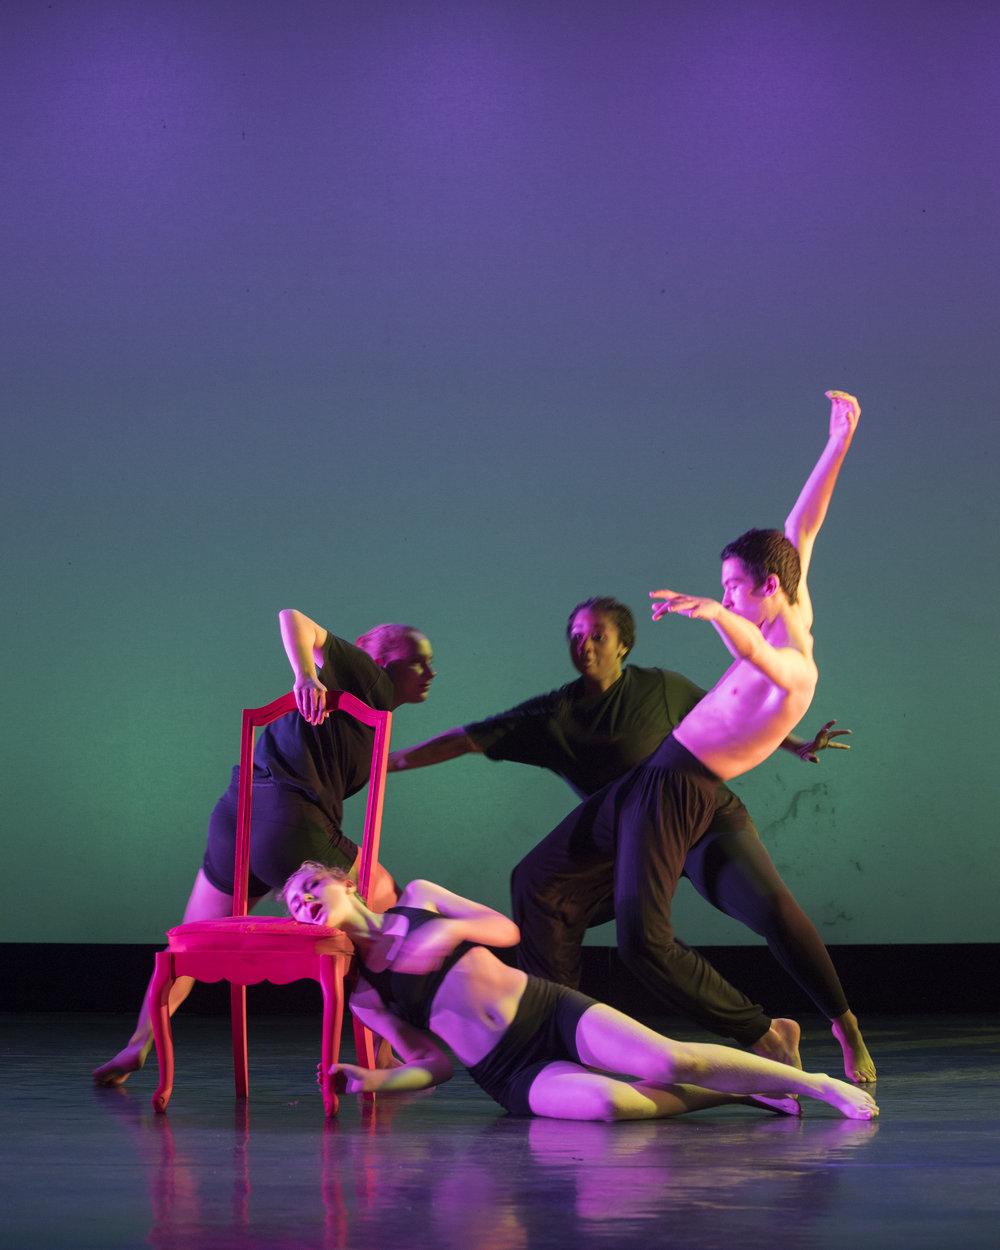 Dance Show by Jehanne-Marie Milne-122.jpg